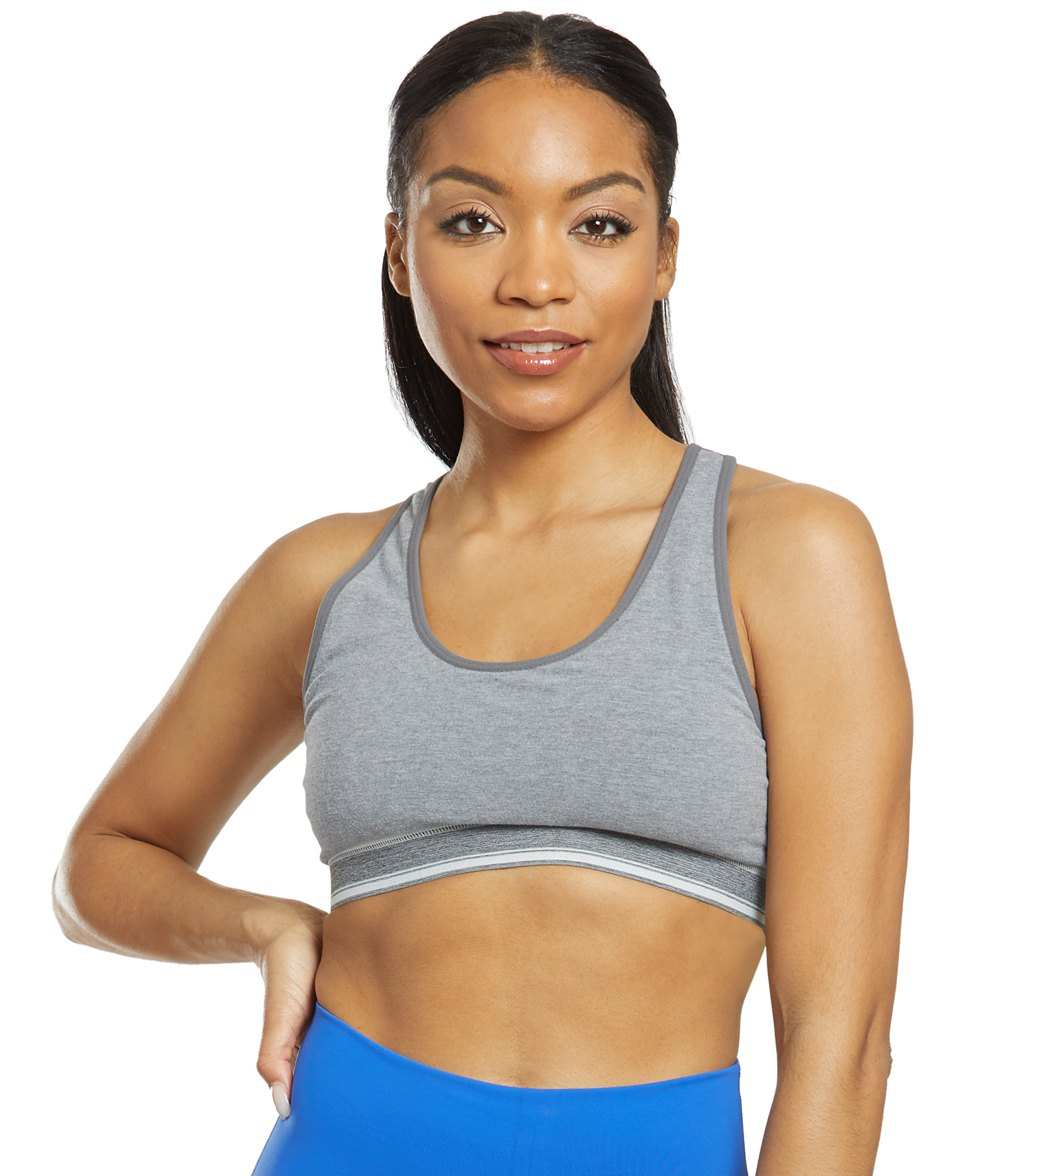 c45241f152 Manduka Eko Cotton Racer Back Yoga Sports Bra at YogaOutlet.com